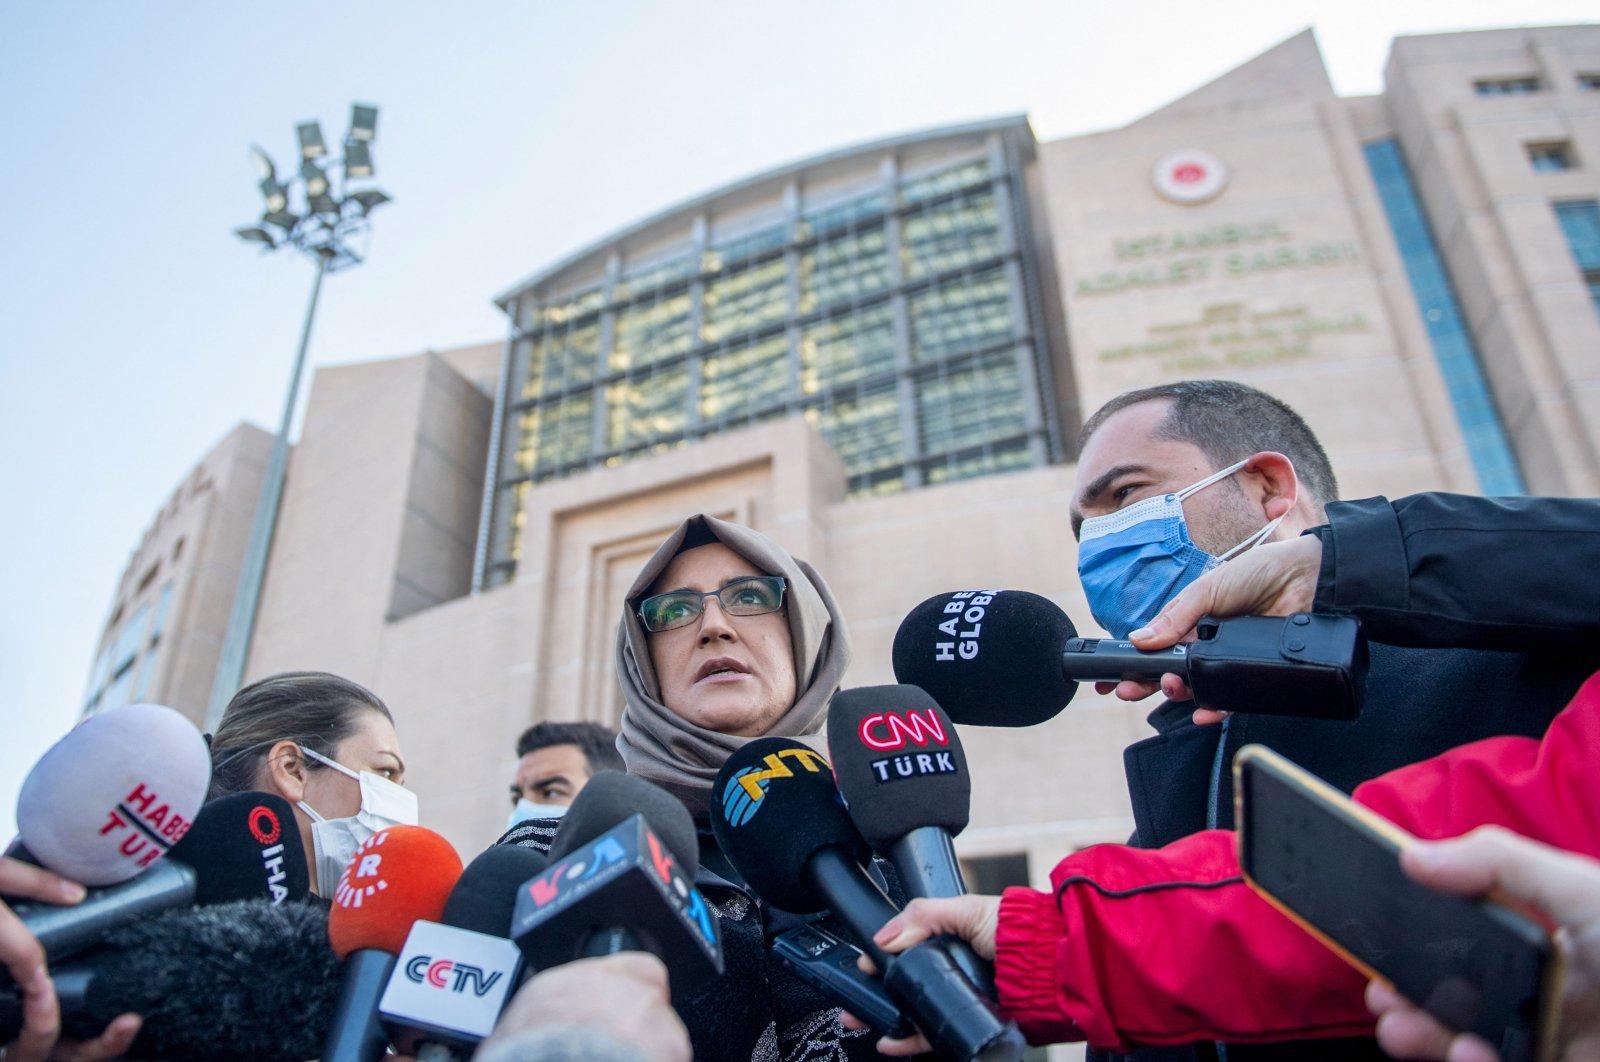 Hatice Cengiz (C) fiancee of slain Saudi dissident journalist Jamal Khashoggi, talks to the press in front of the Istanbul courthouse, Turkey, March 4, 2021. (AFP Photo)